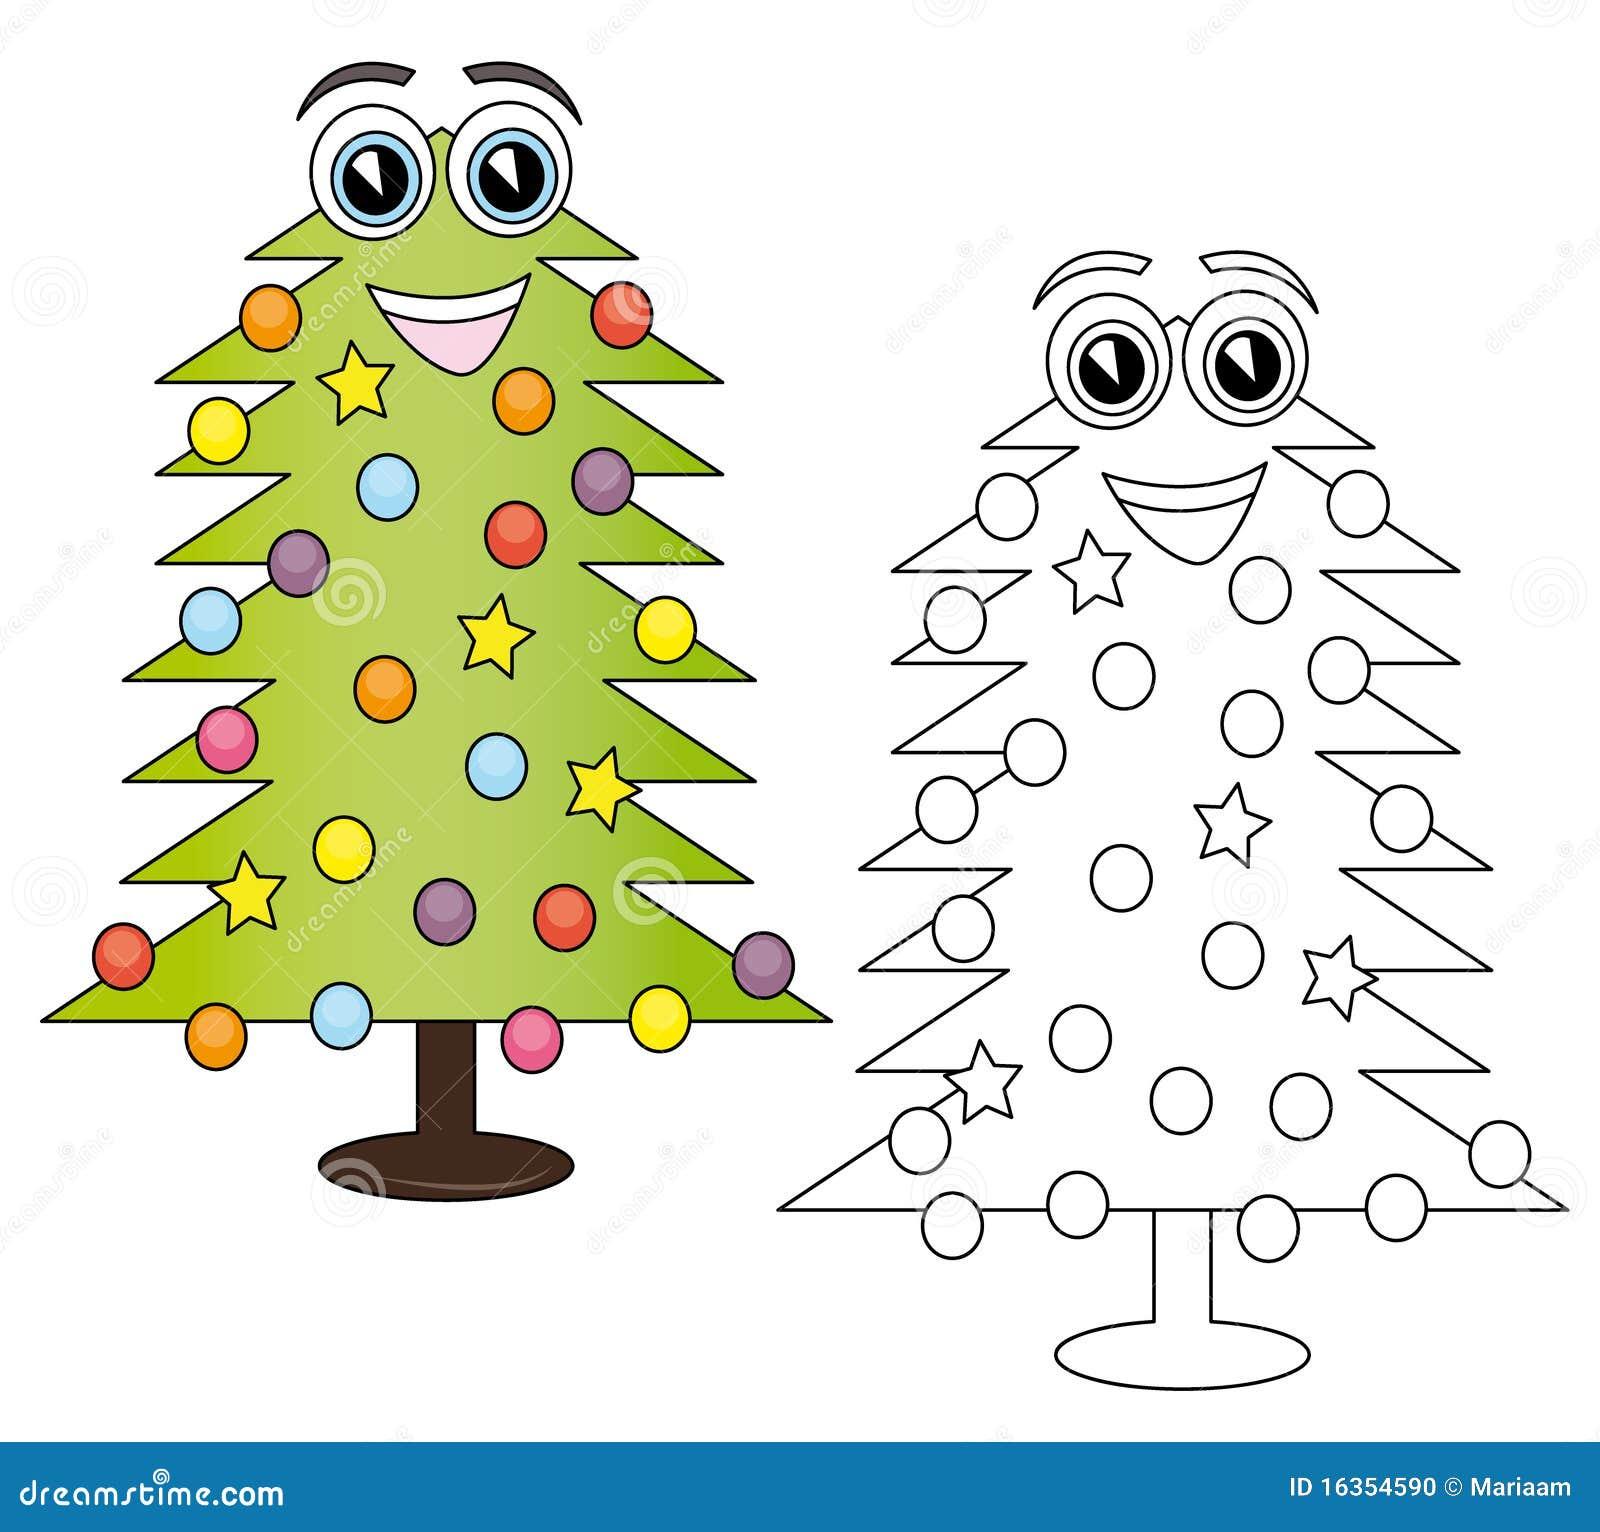 Christmas tree cartoon stock illustration. Illustration of isolated ...